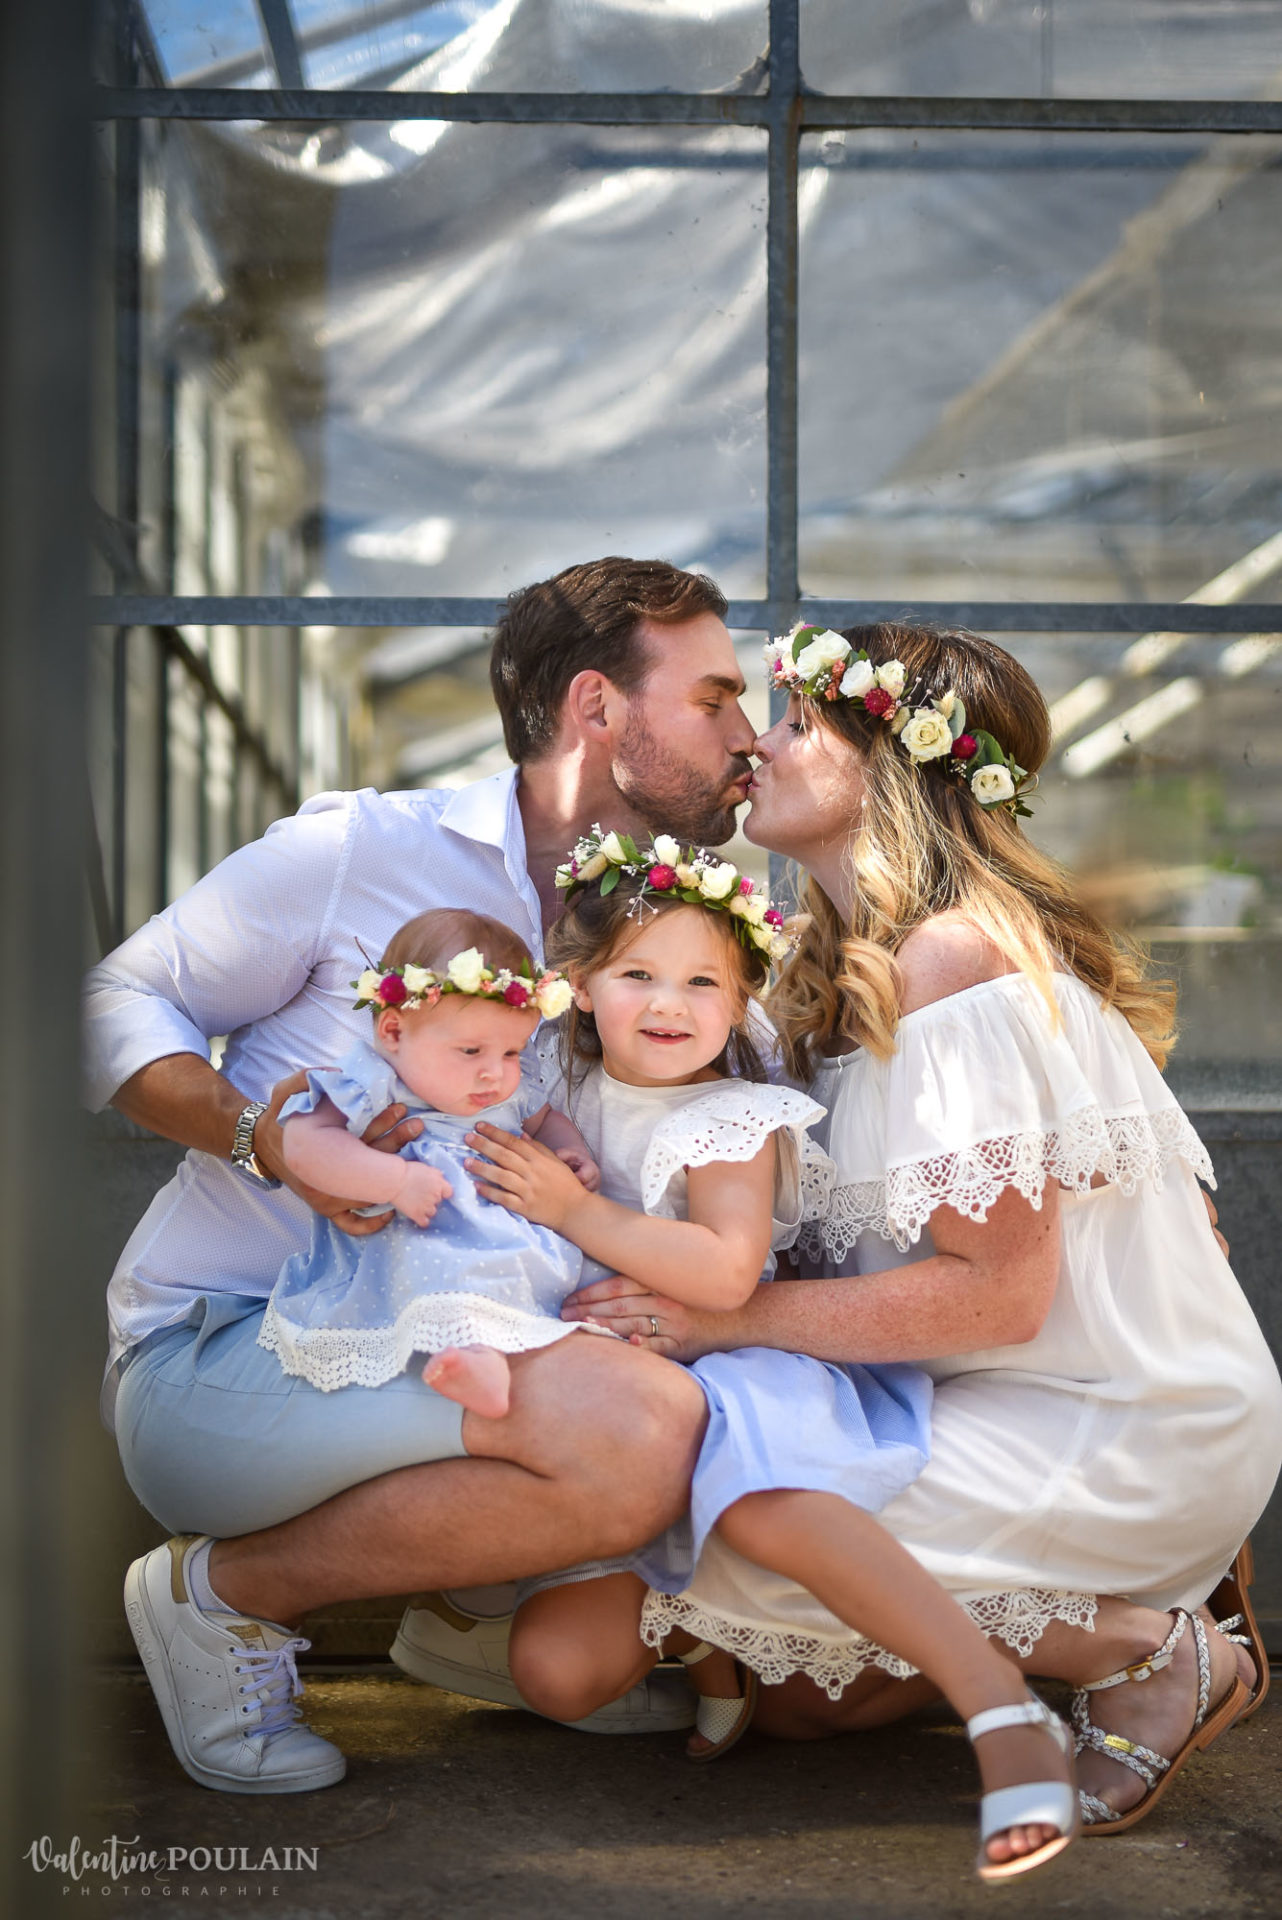 Shooting famille soeurs serre - Valentine Poulain bisou